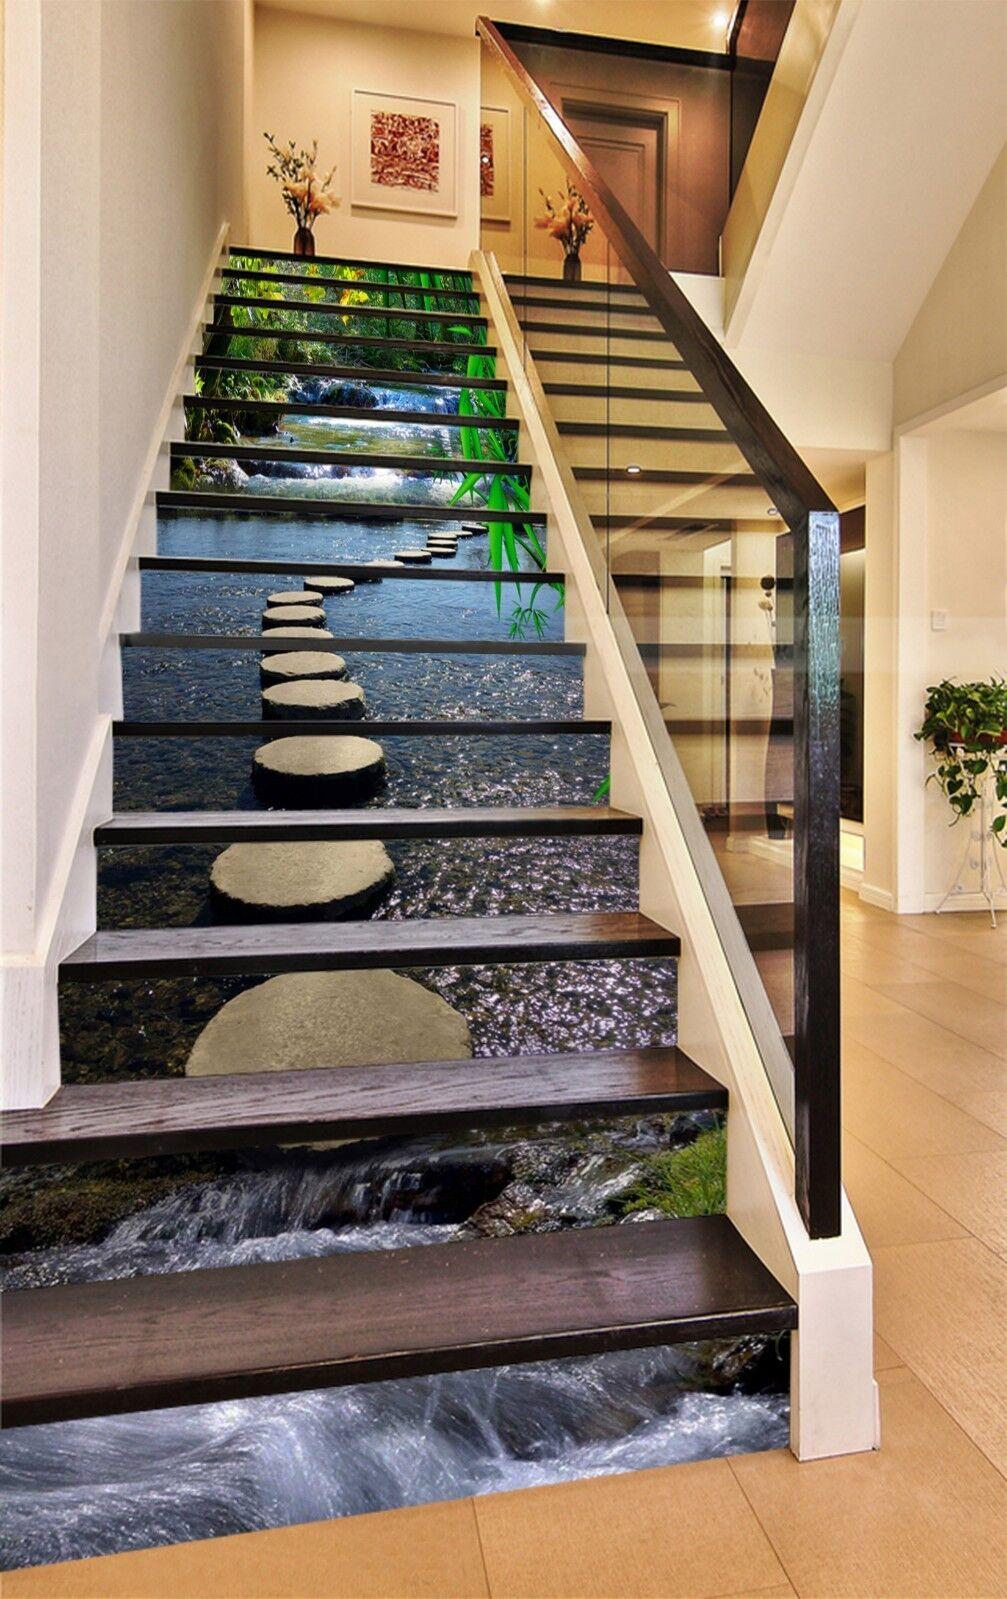 3D Stone Lake Road Stair Risers Decoration Photo Mural Vinyl Decal WandPapier UK